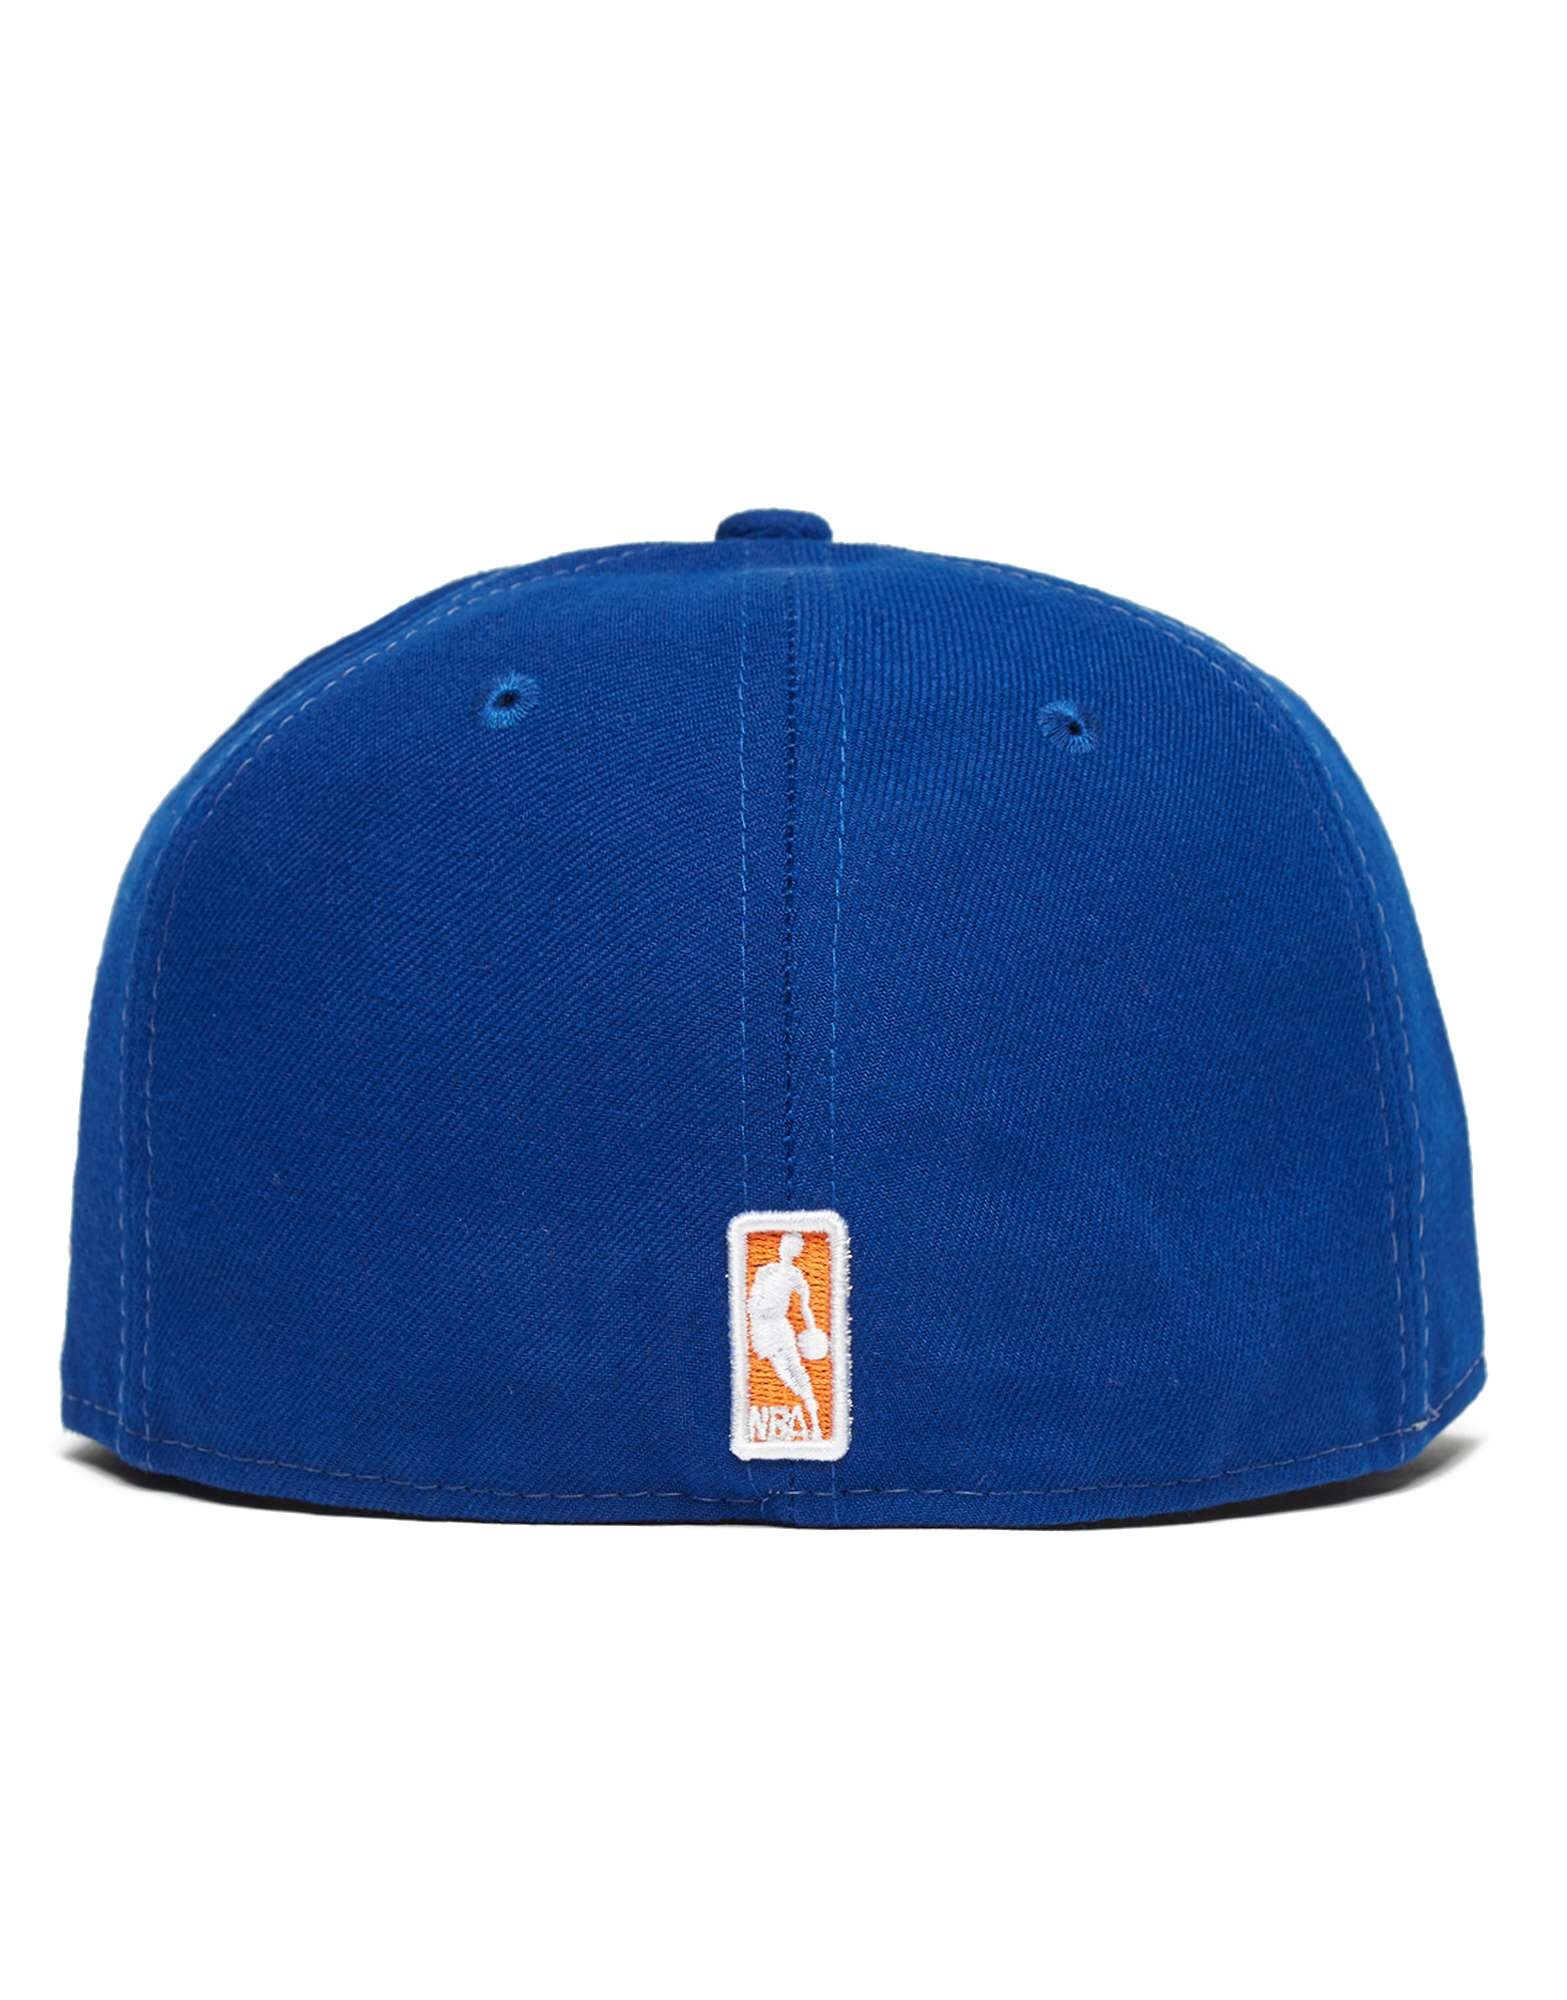 New Era NBA New York Knicks 59FIFTY D Way Cap